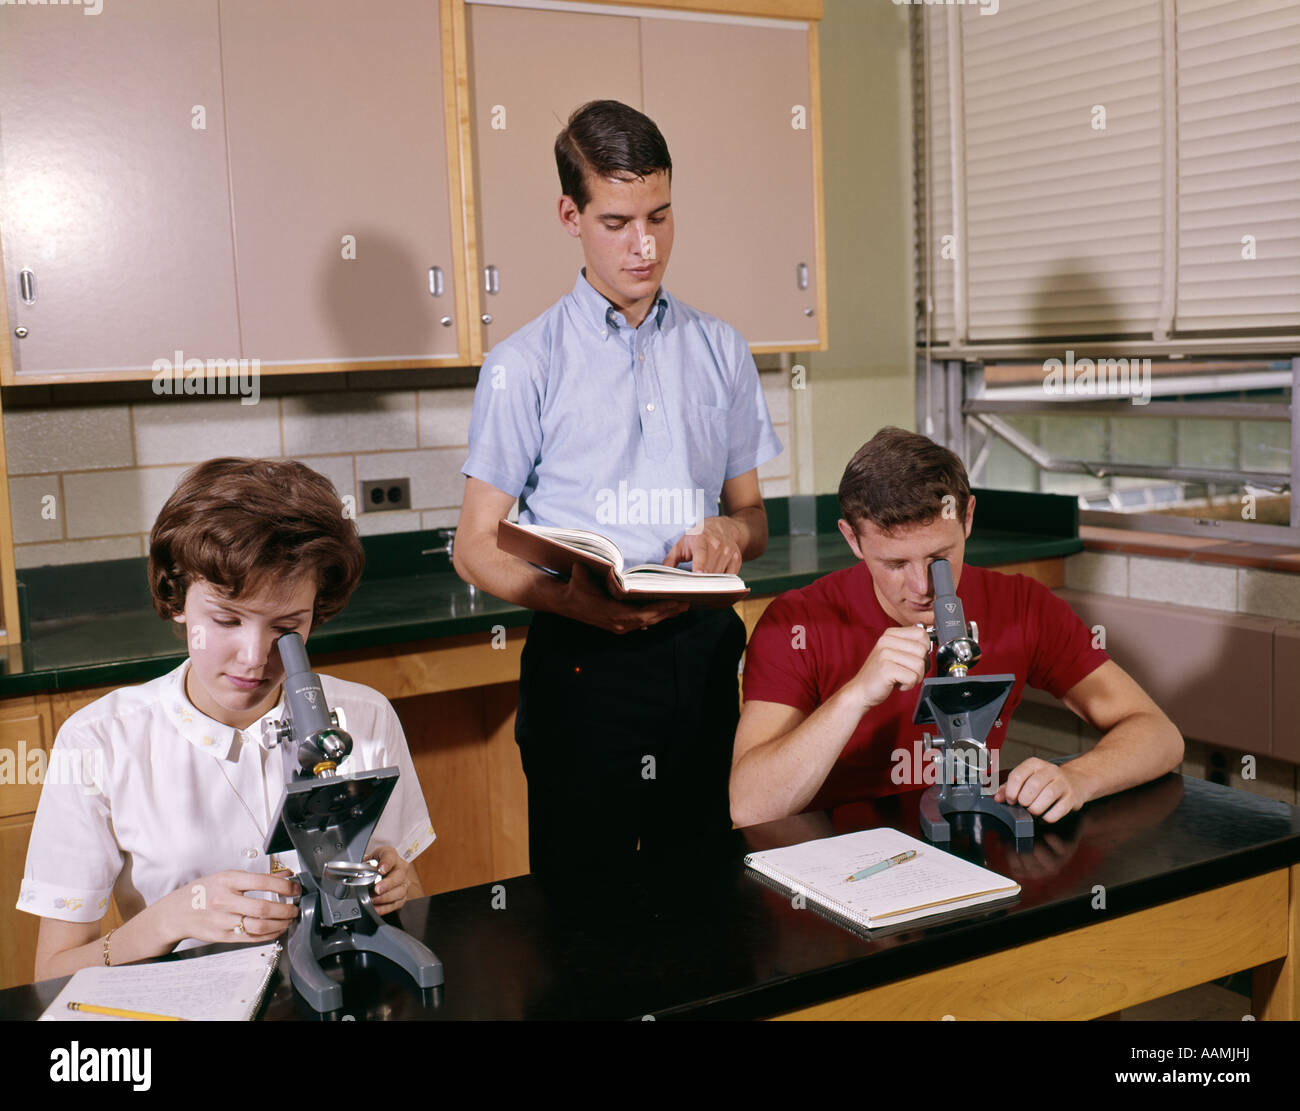 1960s 3 College High School Teen Student Students In